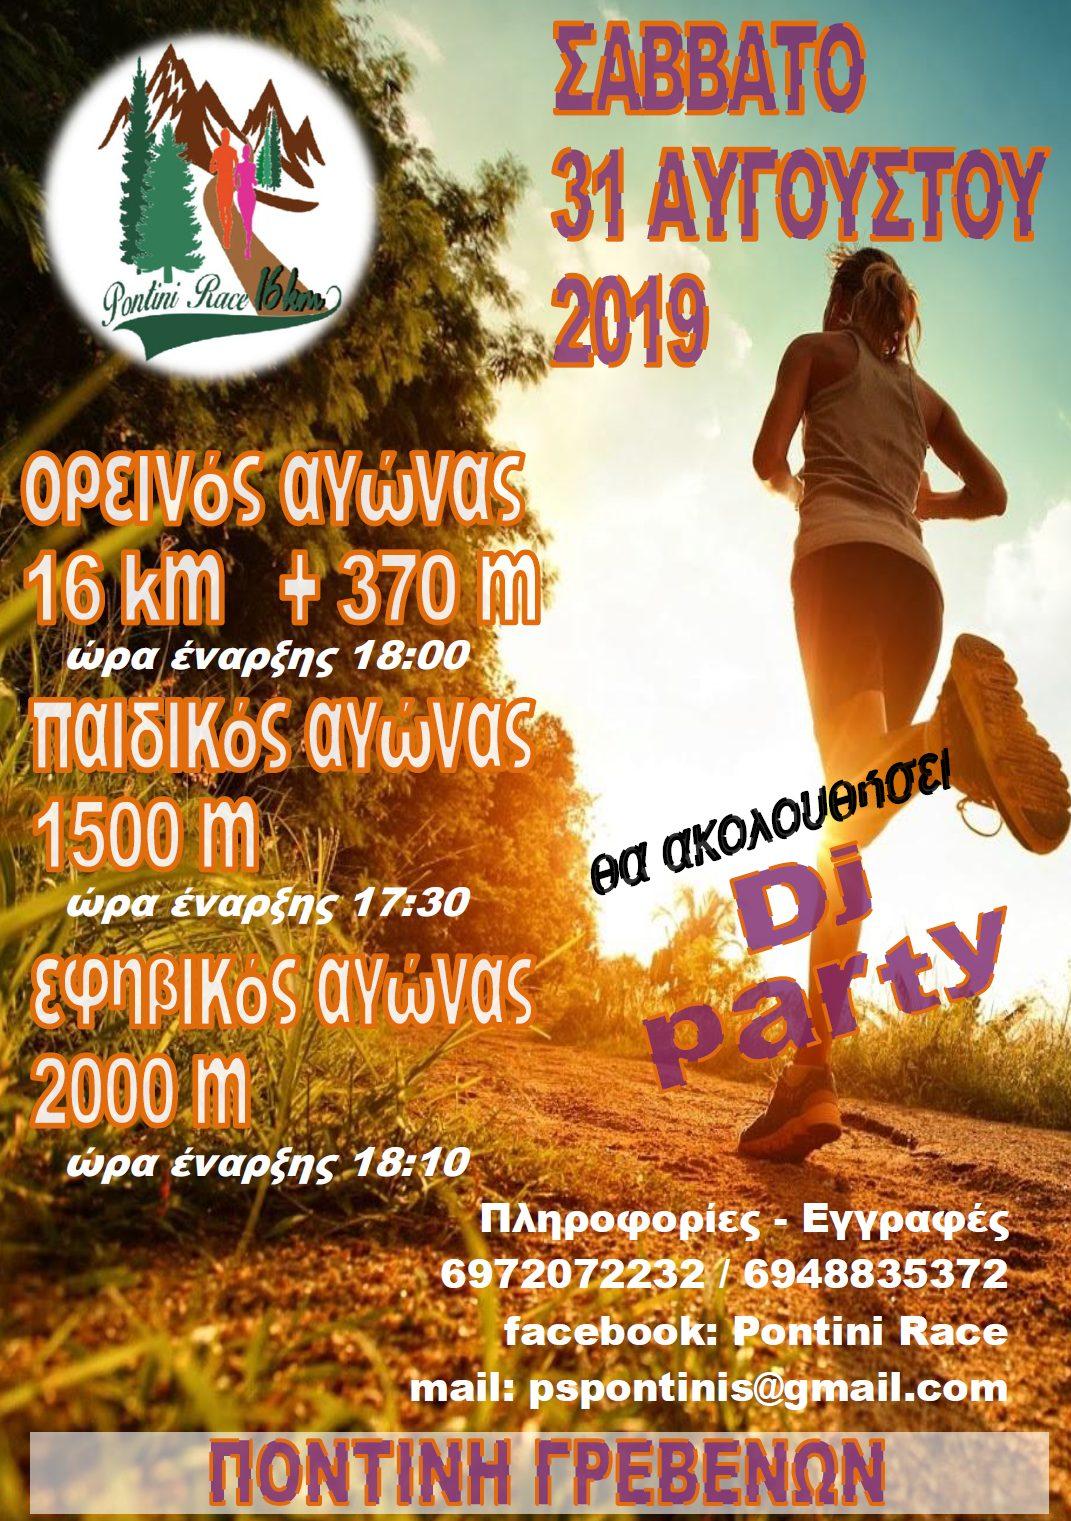 PontiniRace: 6οςαγώνας ορεινού δρόμου τοΣάββατο 31 Αυγούστου στην Ποντινή Γρεβενών